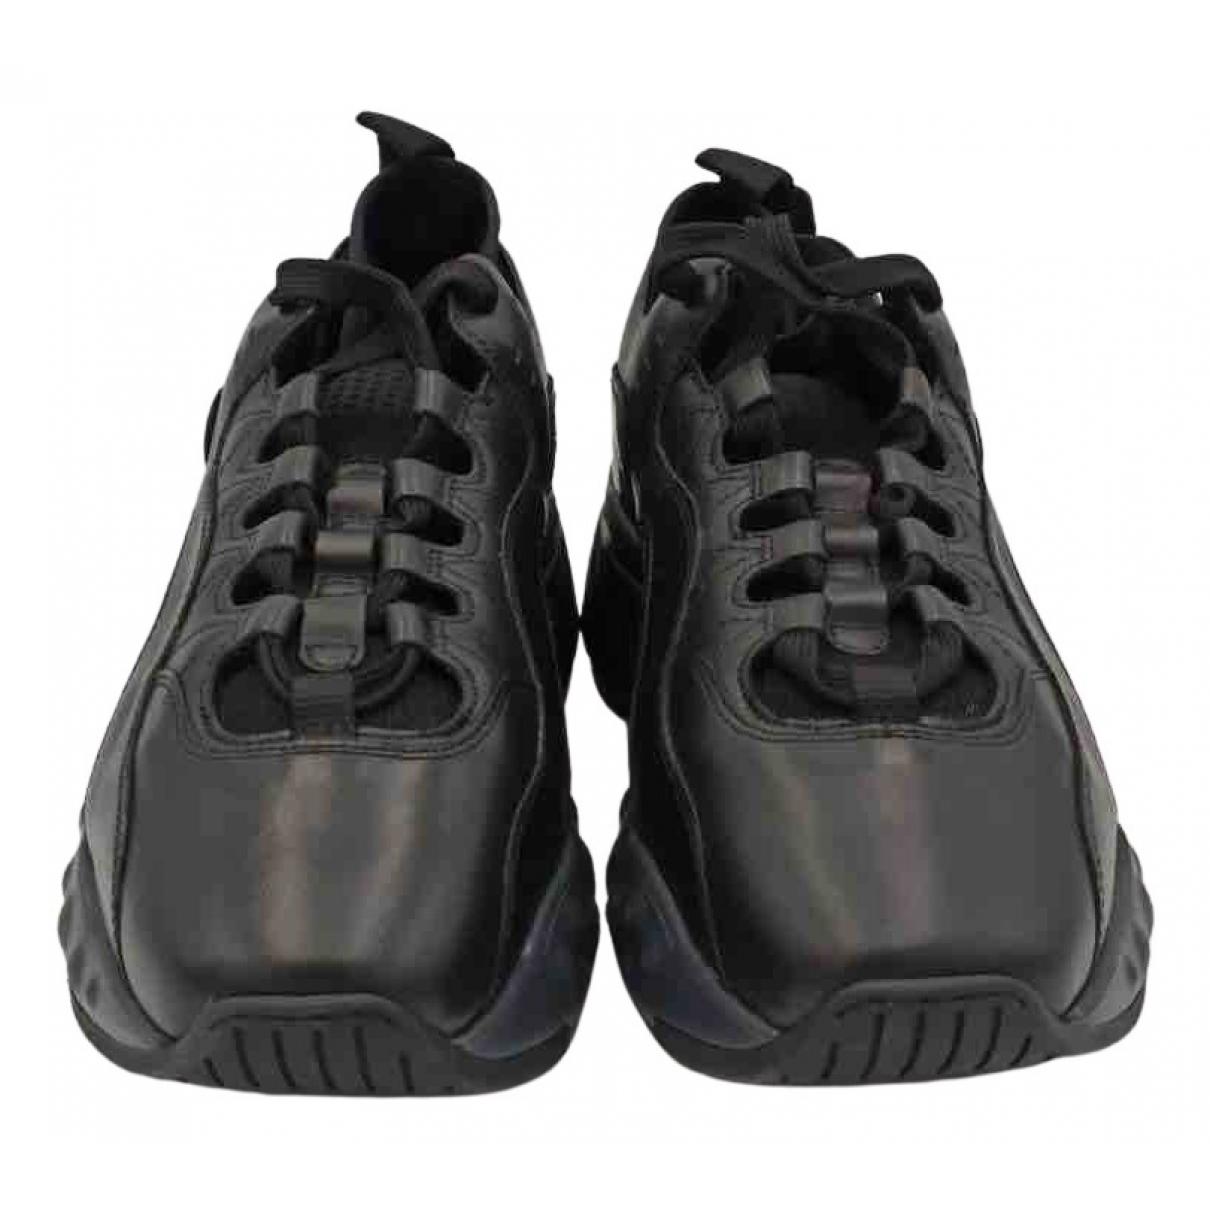 Acne Studios Rockaway Black Leather Trainers for Men 42 EU